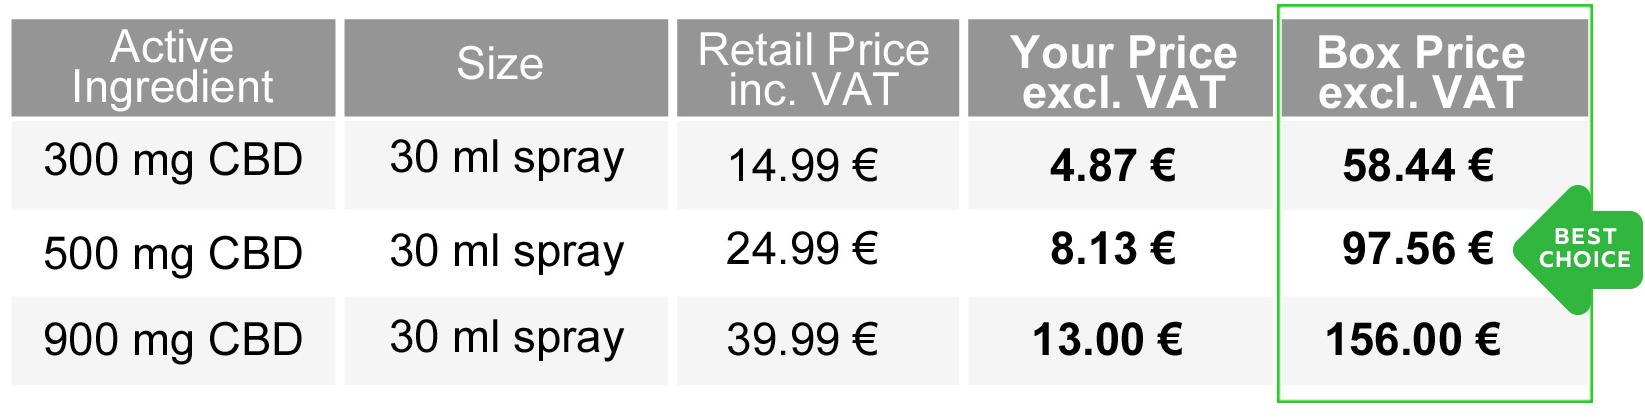 cbd oil spray box price